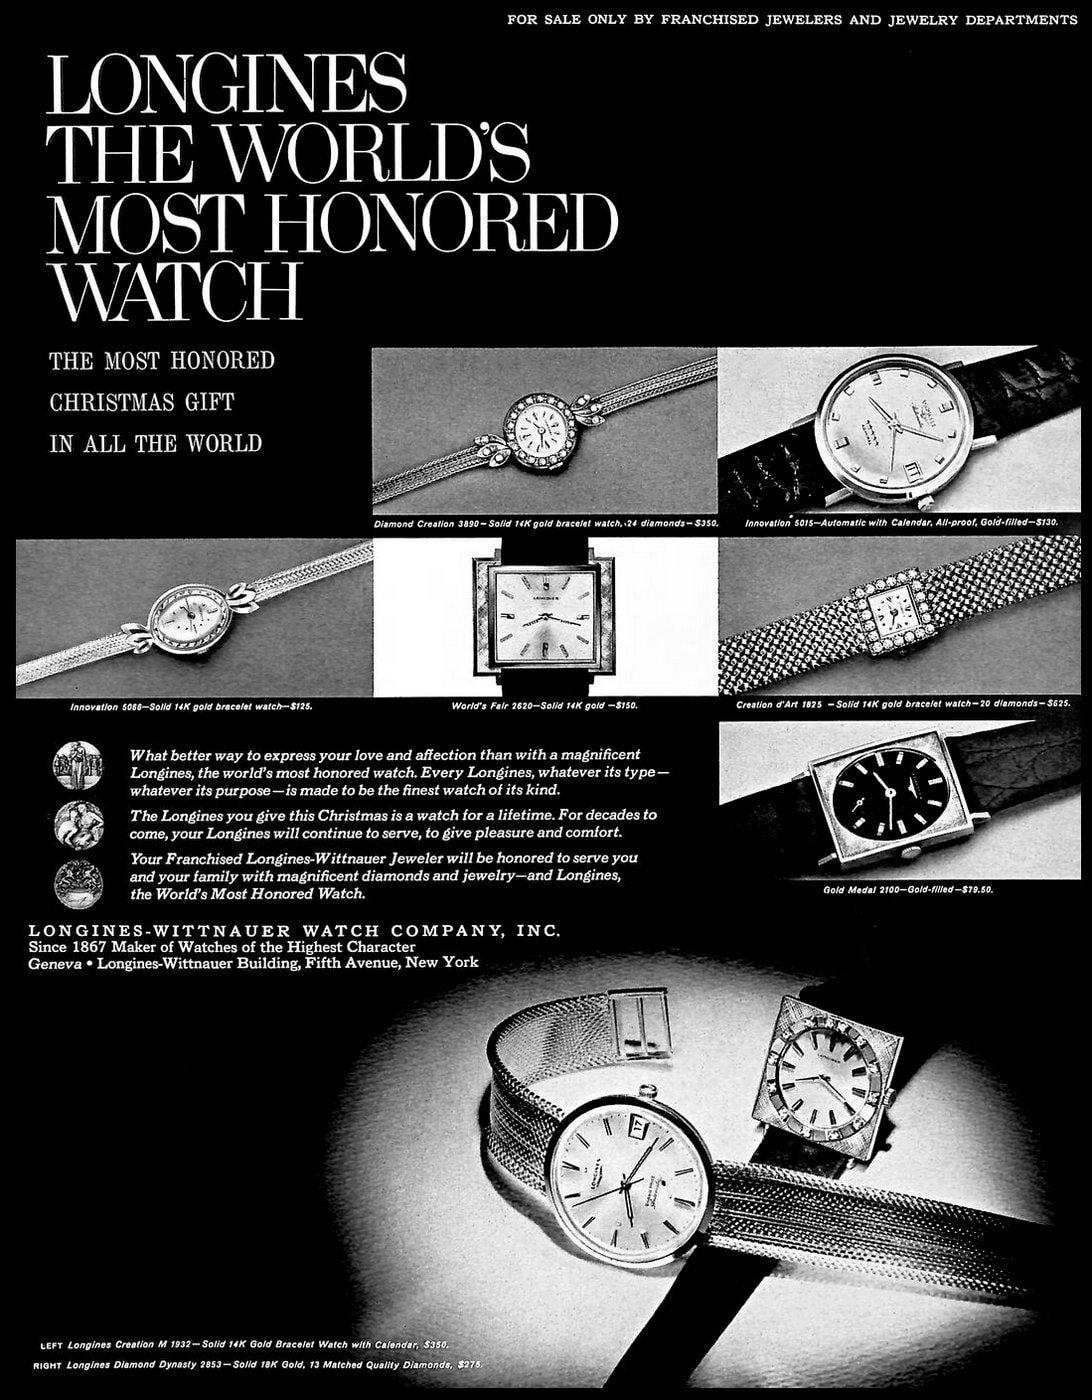 Vintage Longines-Wittnauer watches (1965)